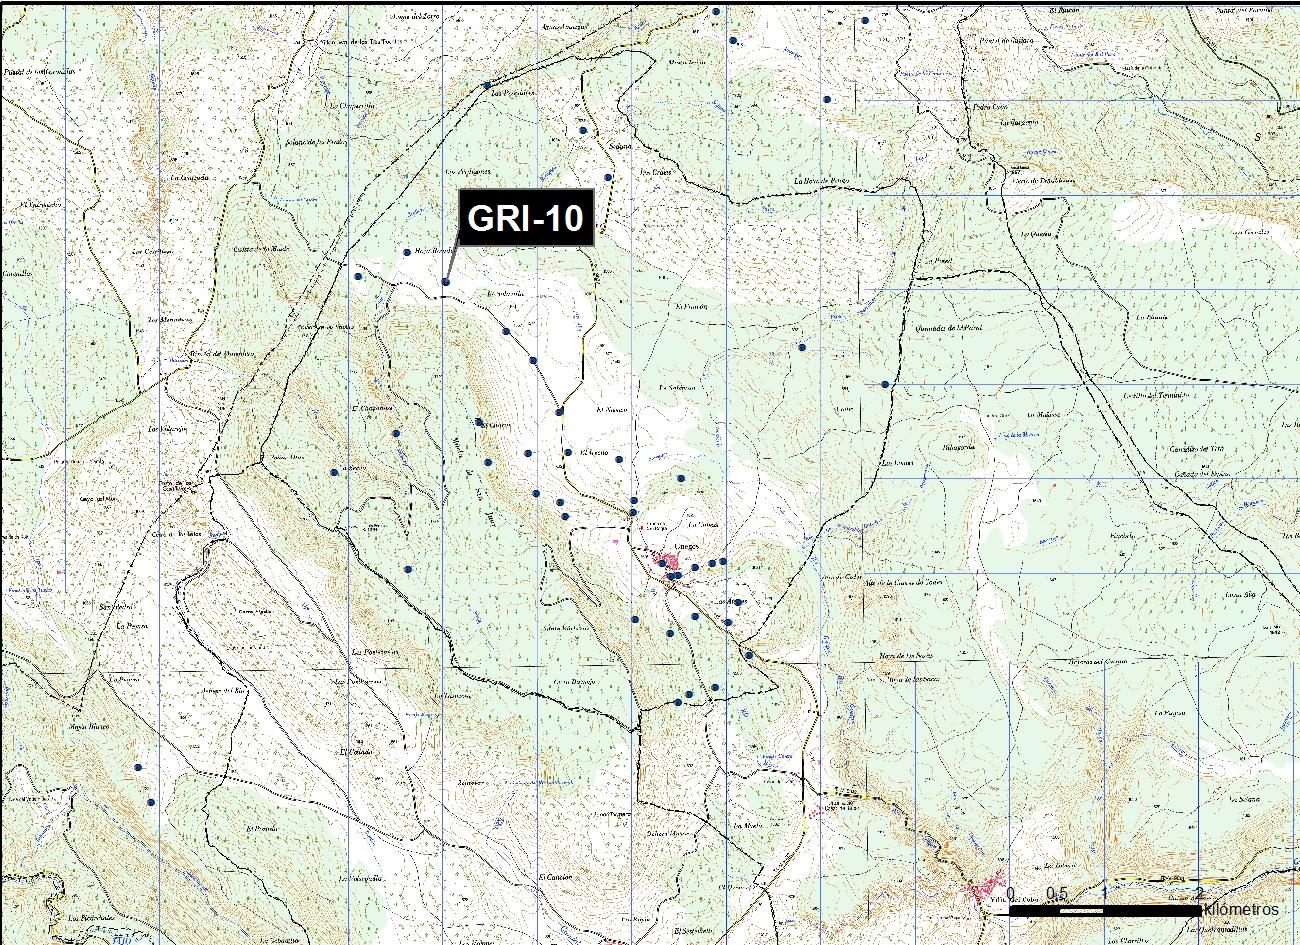 GRI_10_M.V.LOZANO_CHARABASA_MAP.TOPO 1